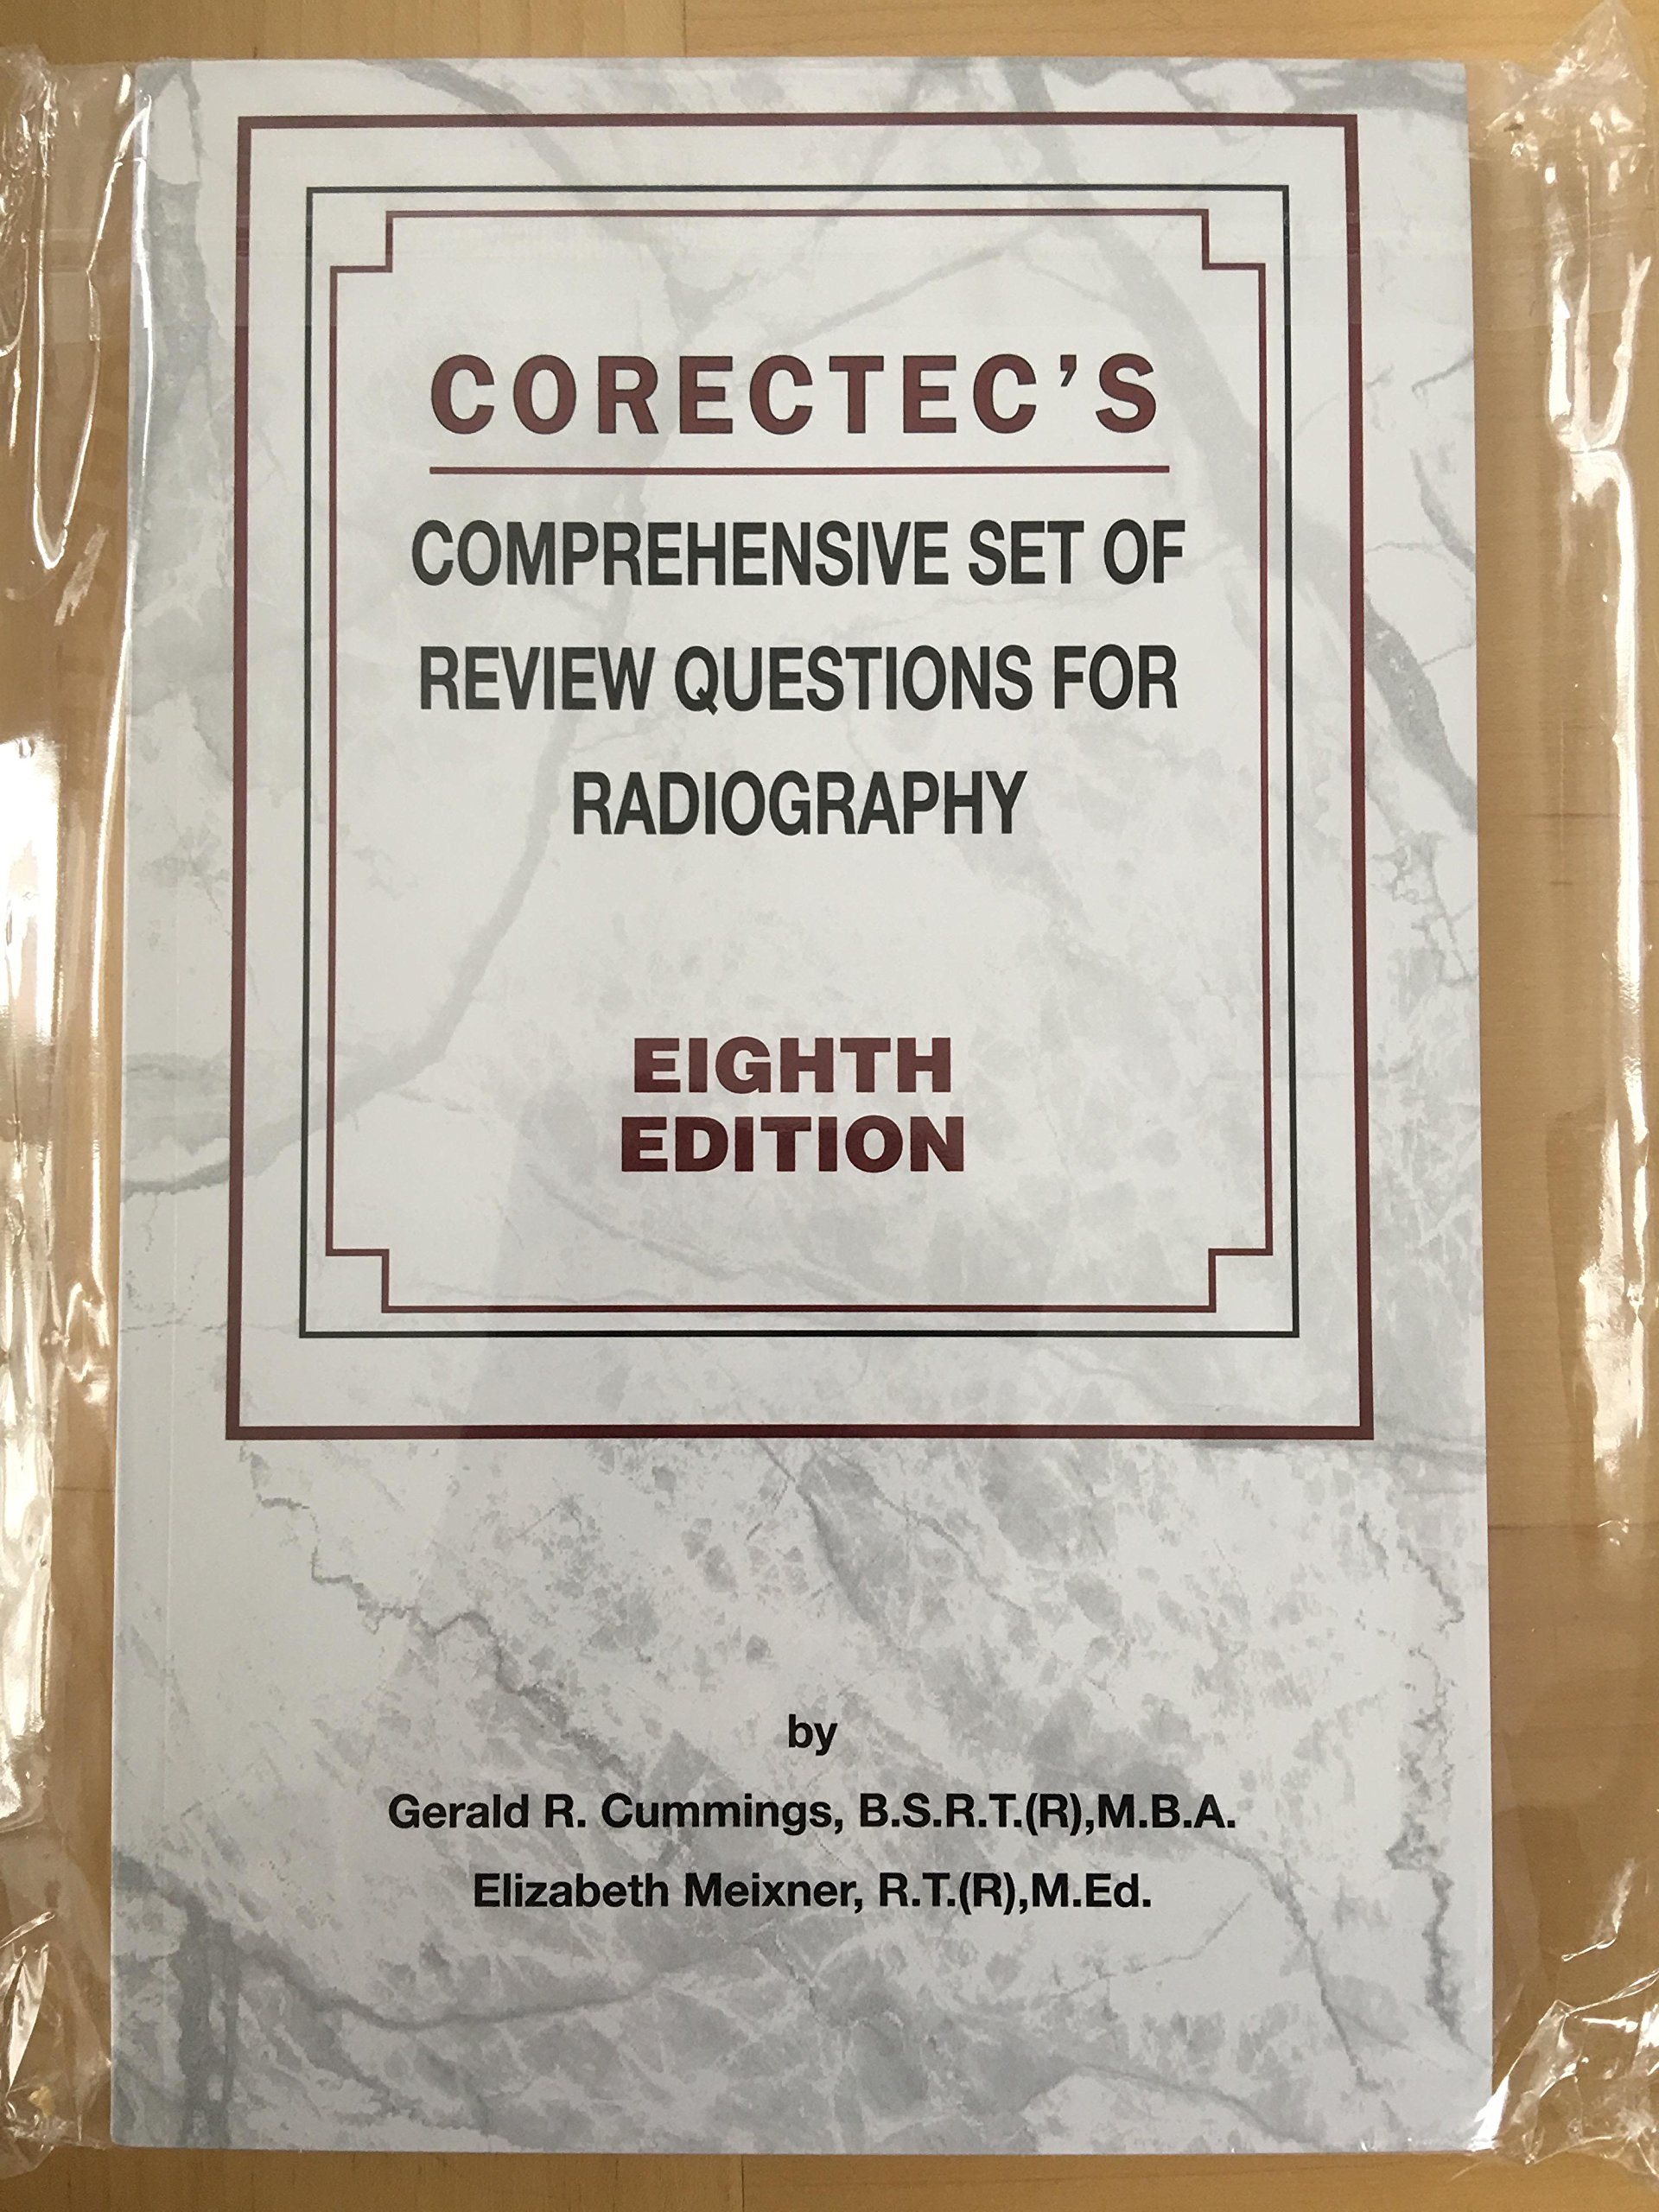 Corectec's Comprehensive Set of Review Questions for Radiography: B.S.R.T.  (R), M.B.A. Gerald R. Cummings, R.T. (R), M. Ed. Elizabeth Meixner: ...